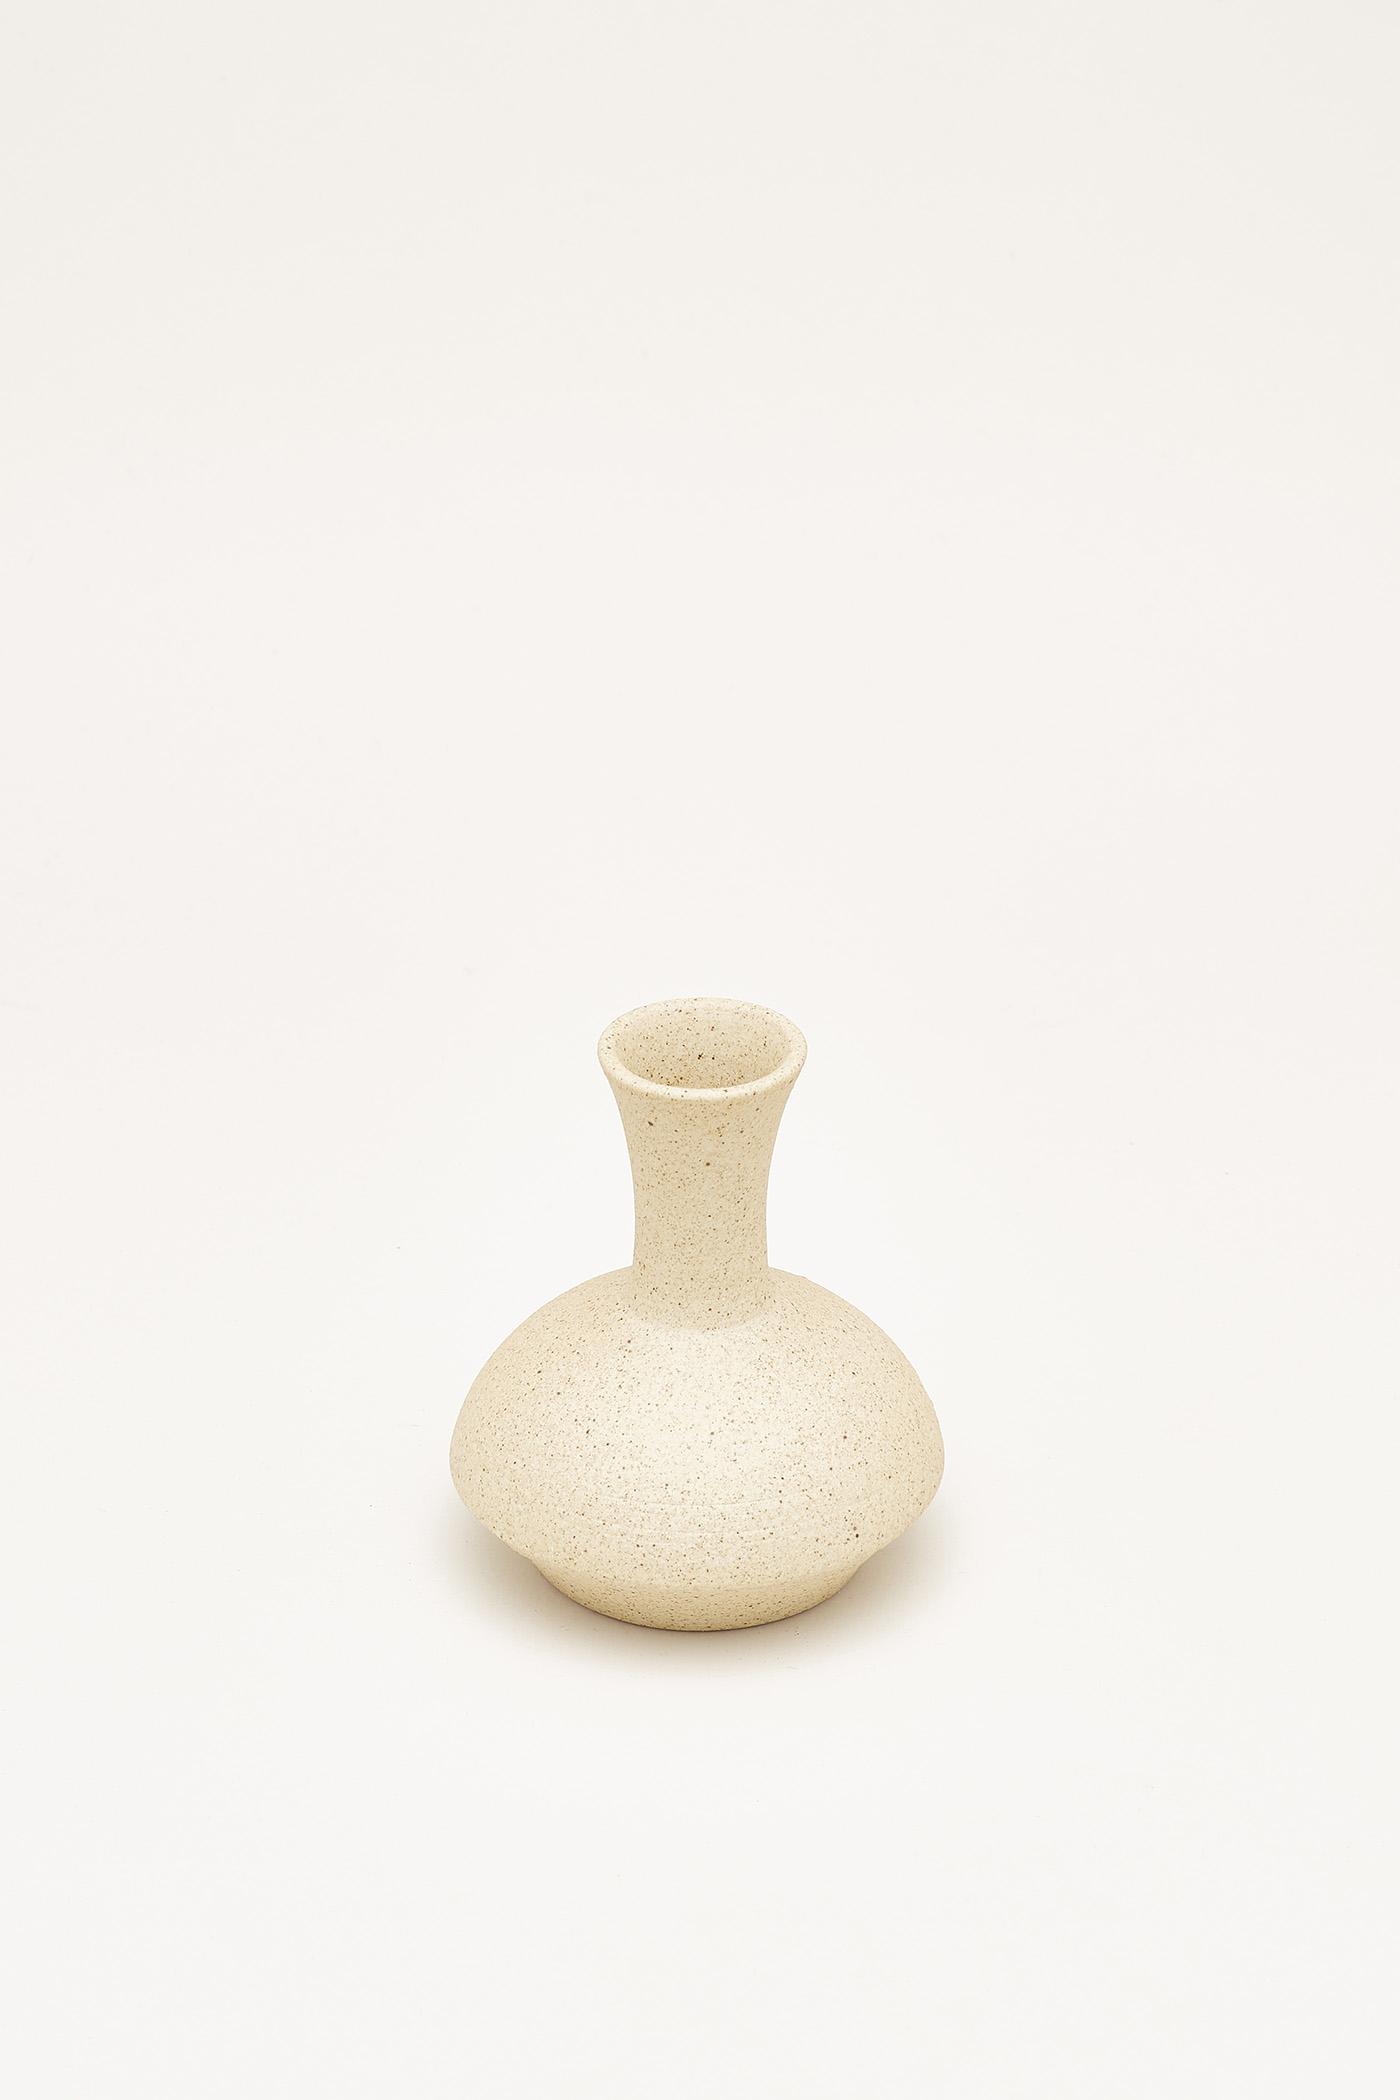 Deyma Flat Bud Vase